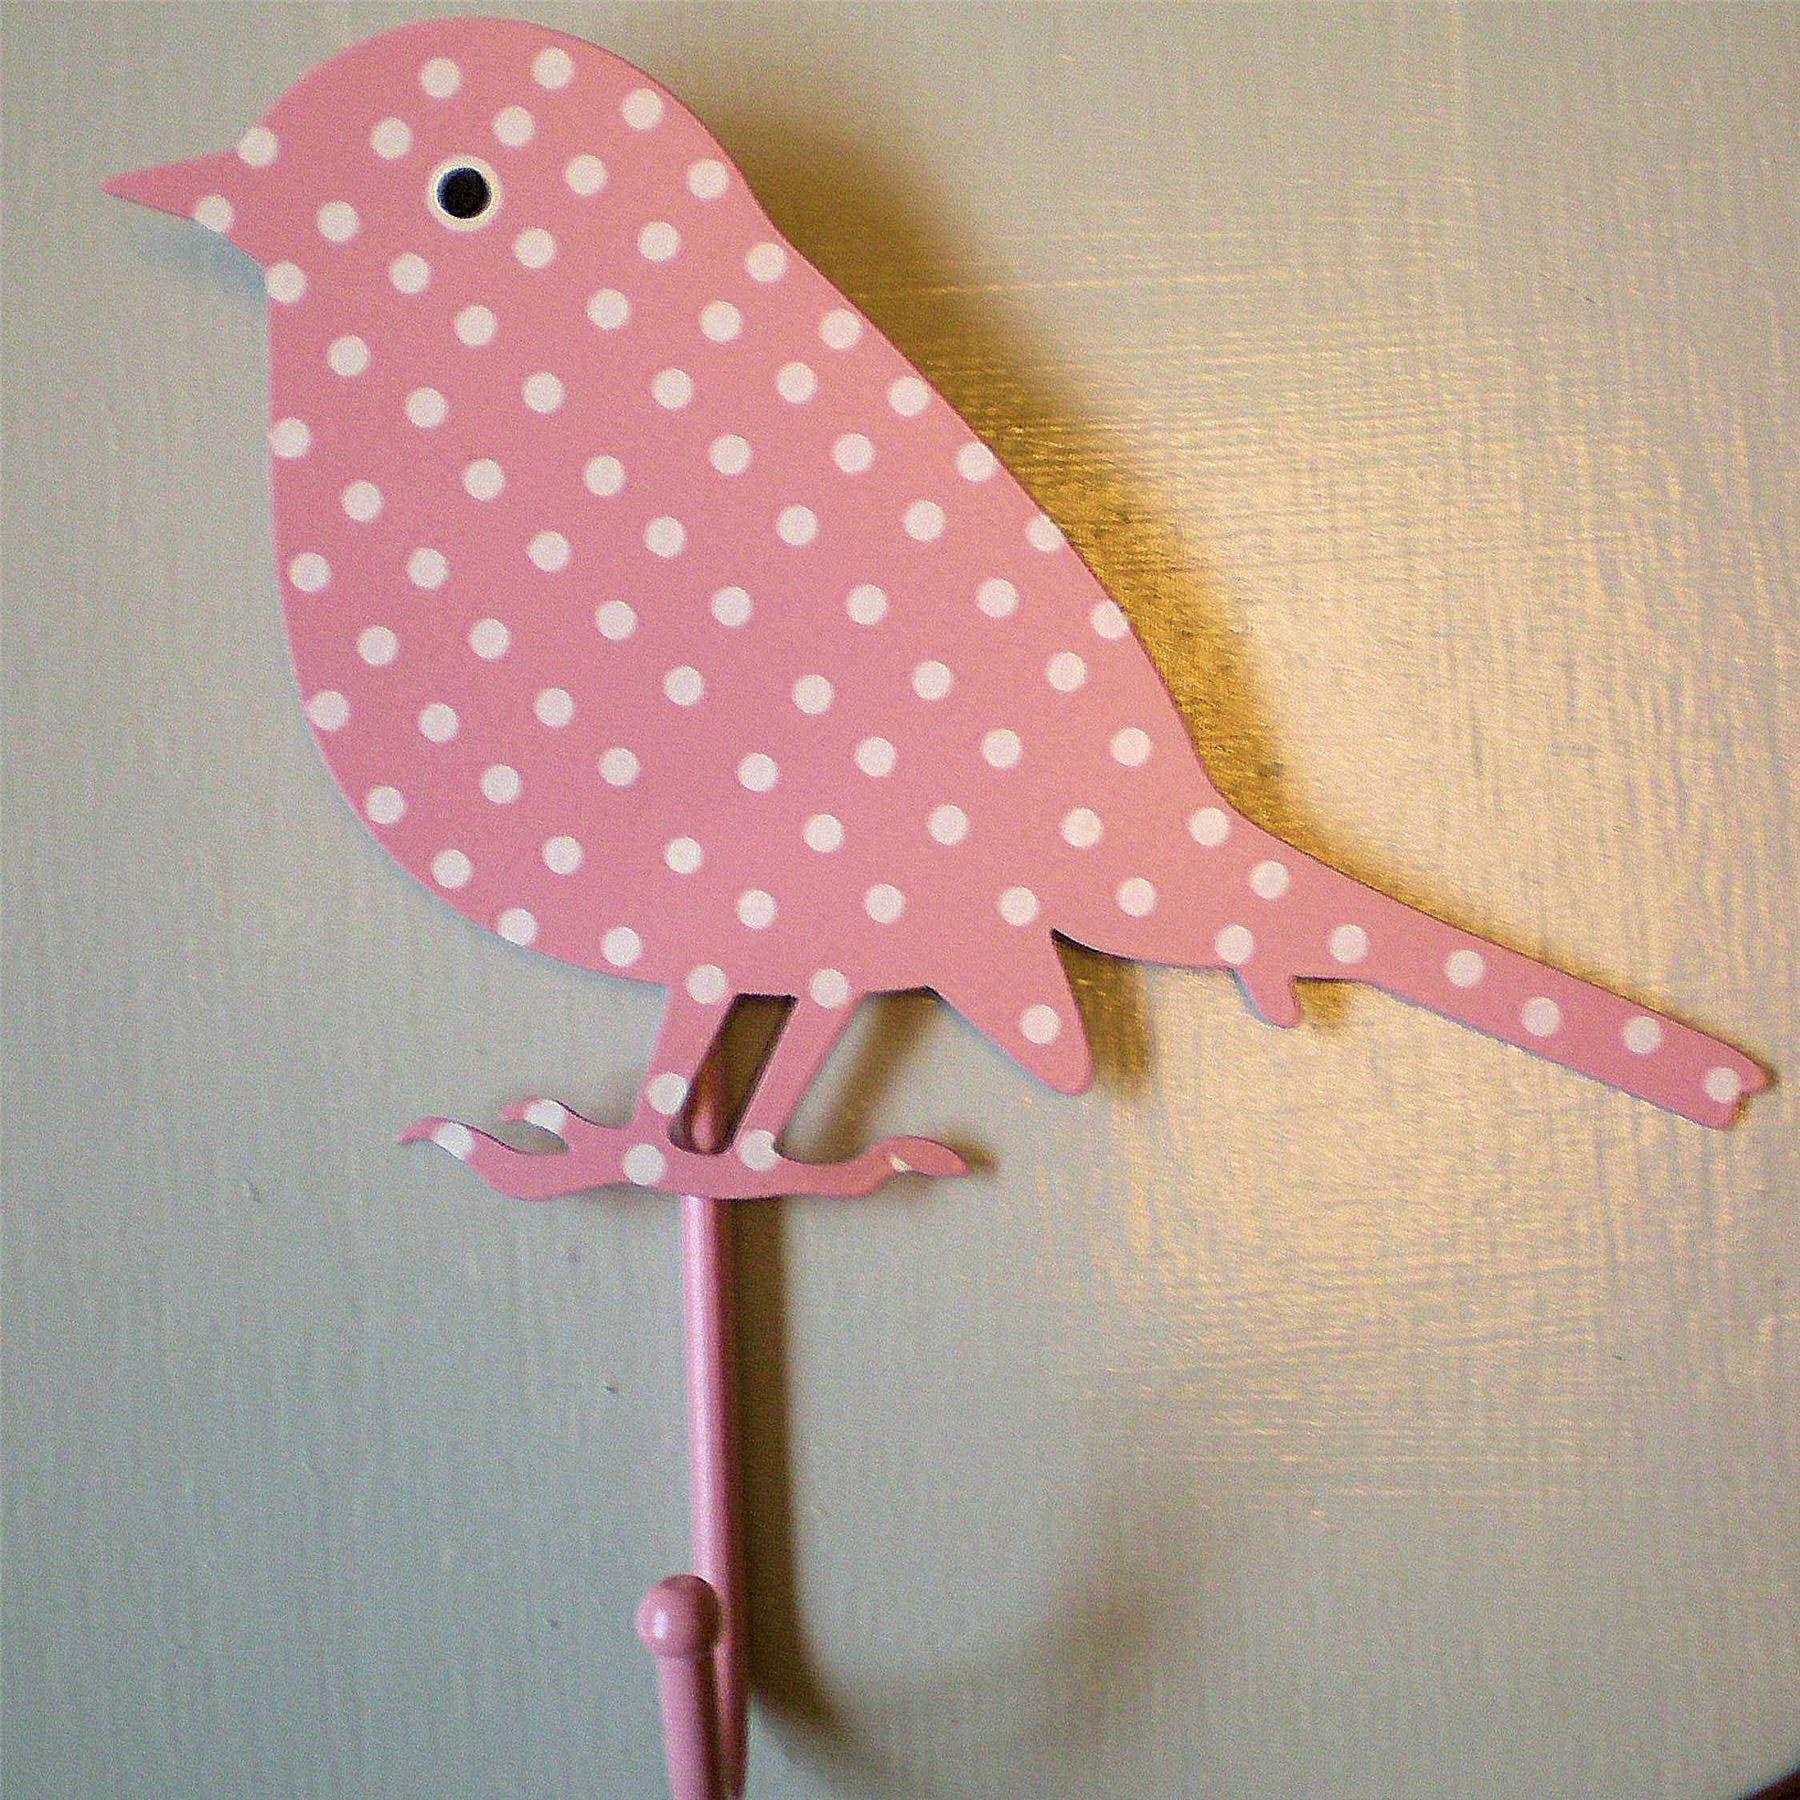 Pink polka dot painted bird coat hooks peg girls bedroom